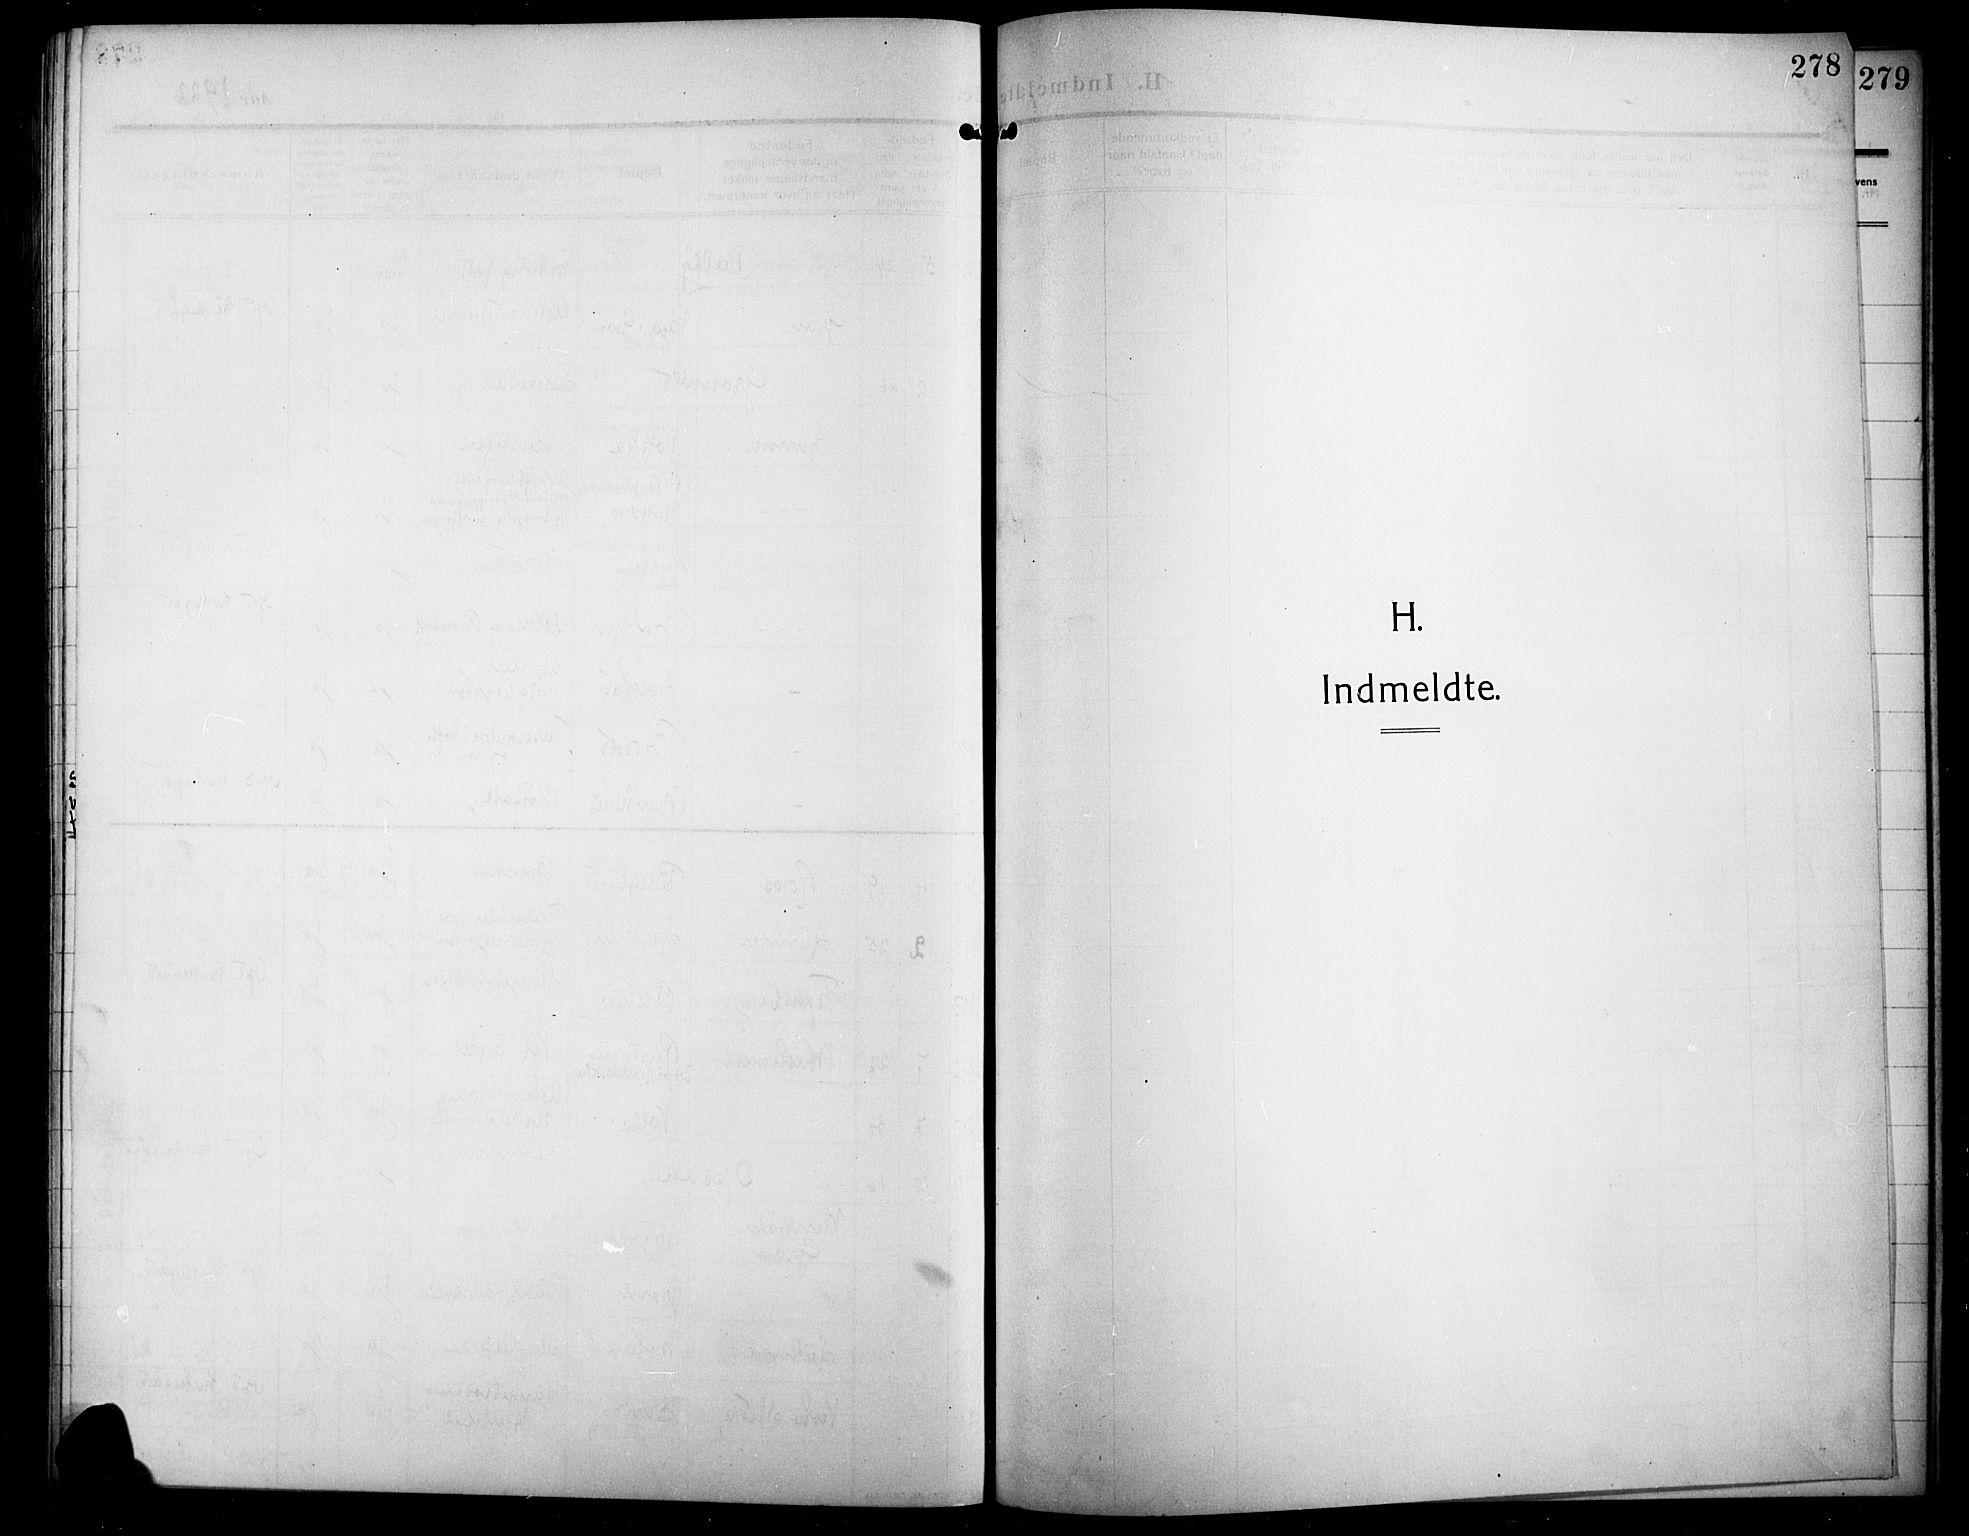 SAH, Lunner prestekontor, H/Ha/Hab/L0001: Klokkerbok nr. 1, 1909-1922, s. 278